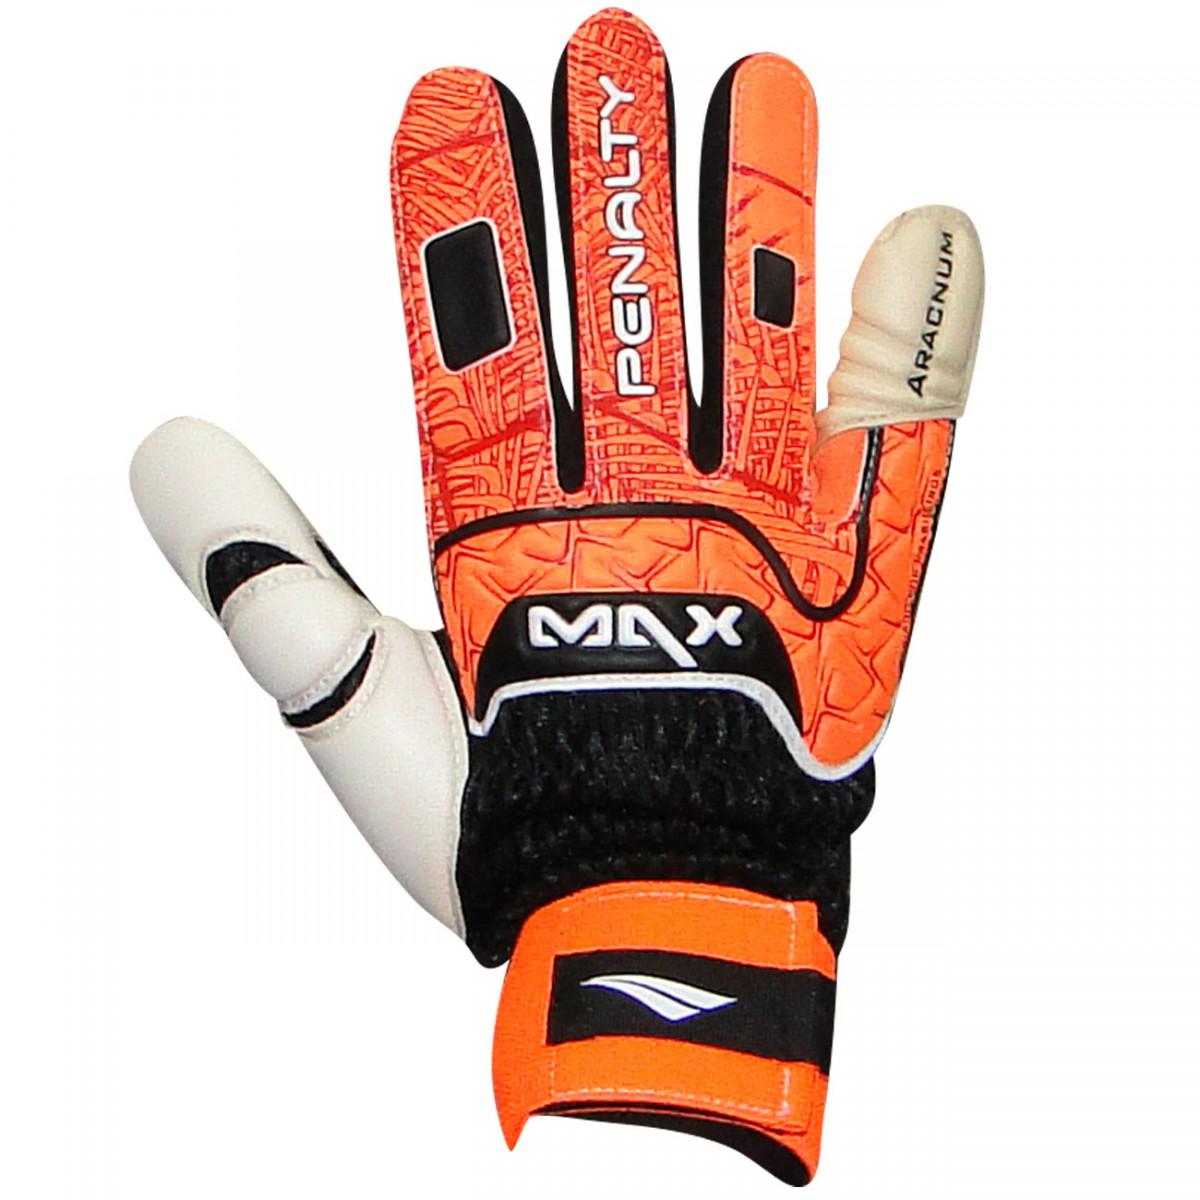 d74d6eada3 Luva Penalty Max Pro IV Futsal 620200968010 - Preto Laranja ...